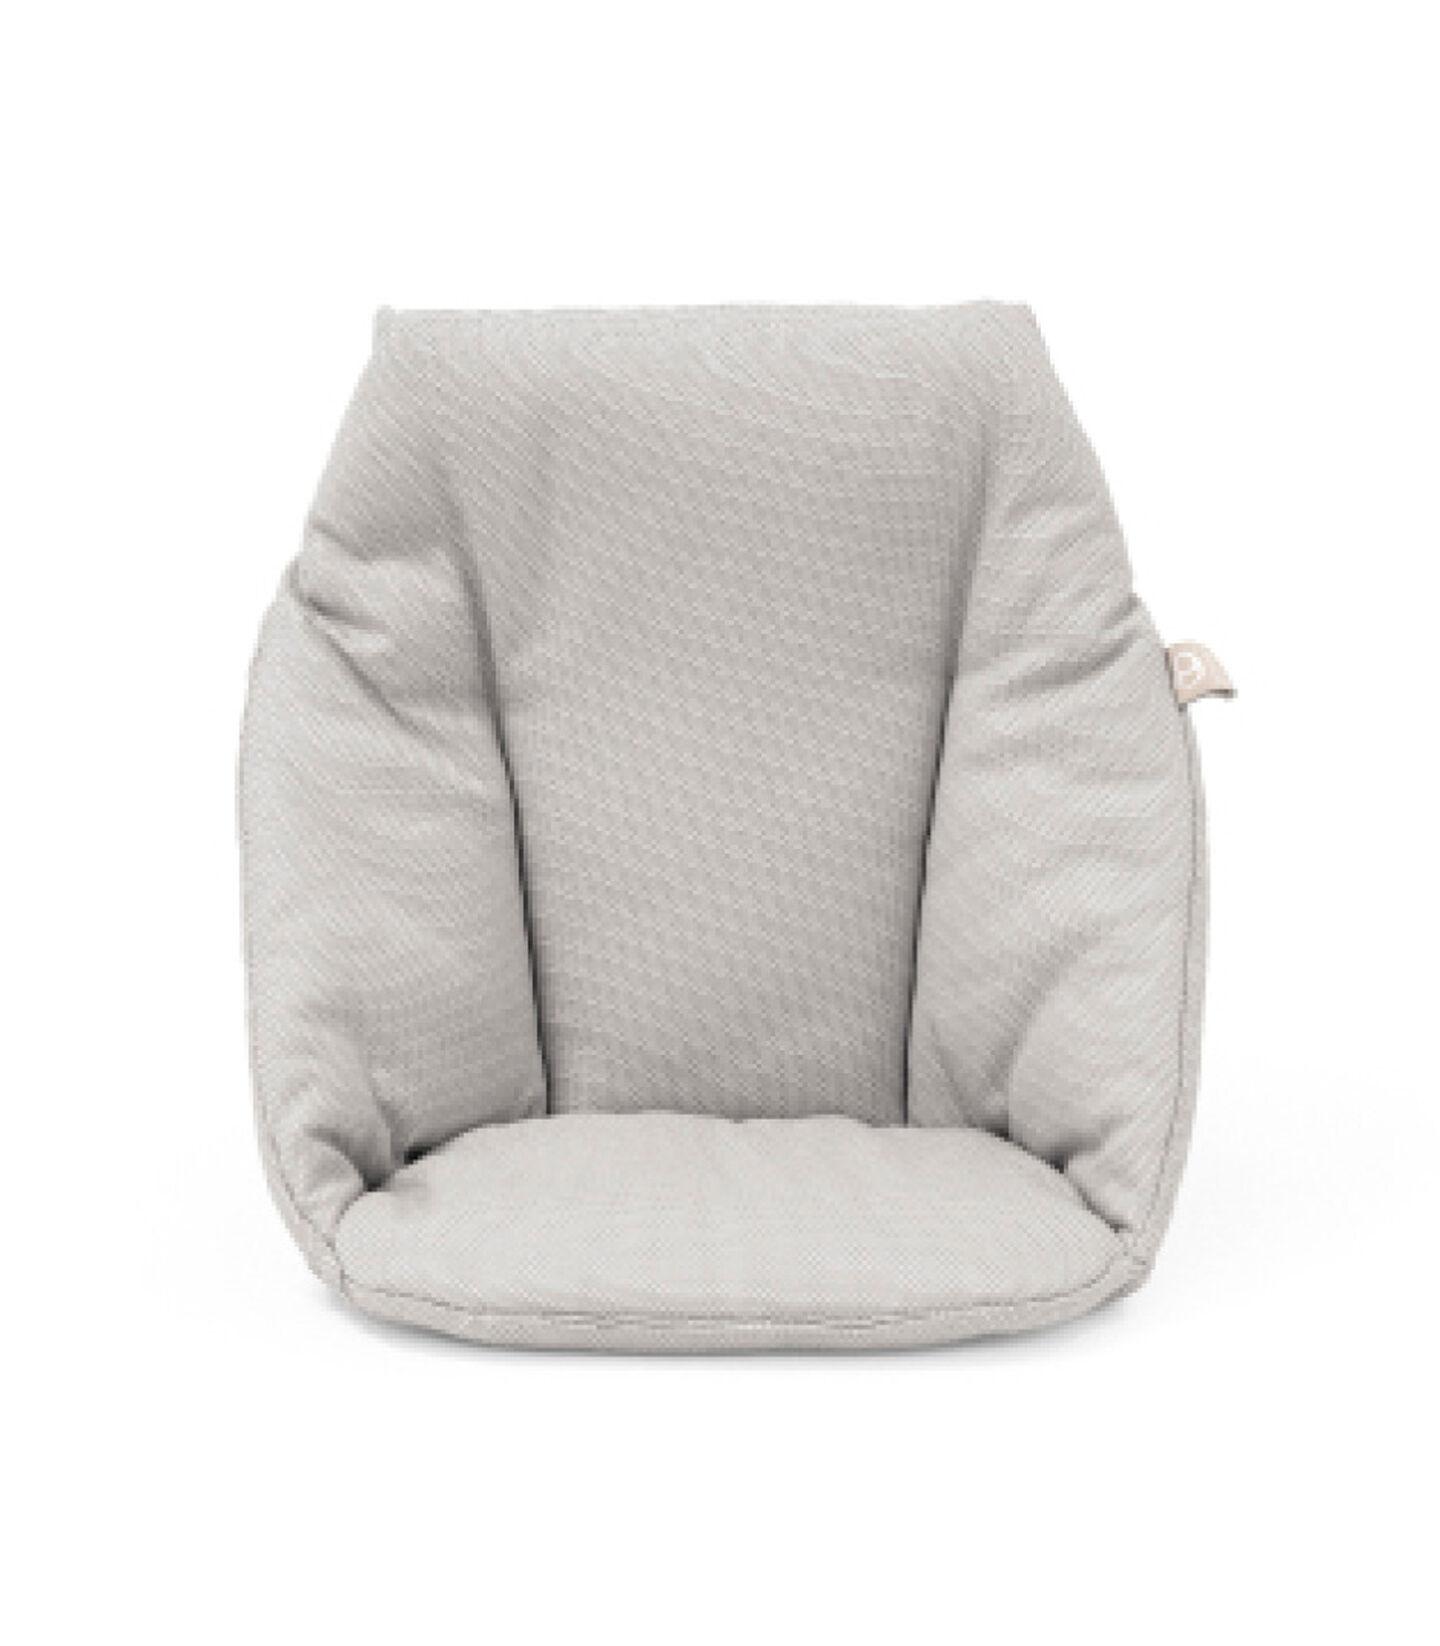 Tripp Trapp® Baby Cushion Timeless Grey OCS, Timeless Grey, mainview